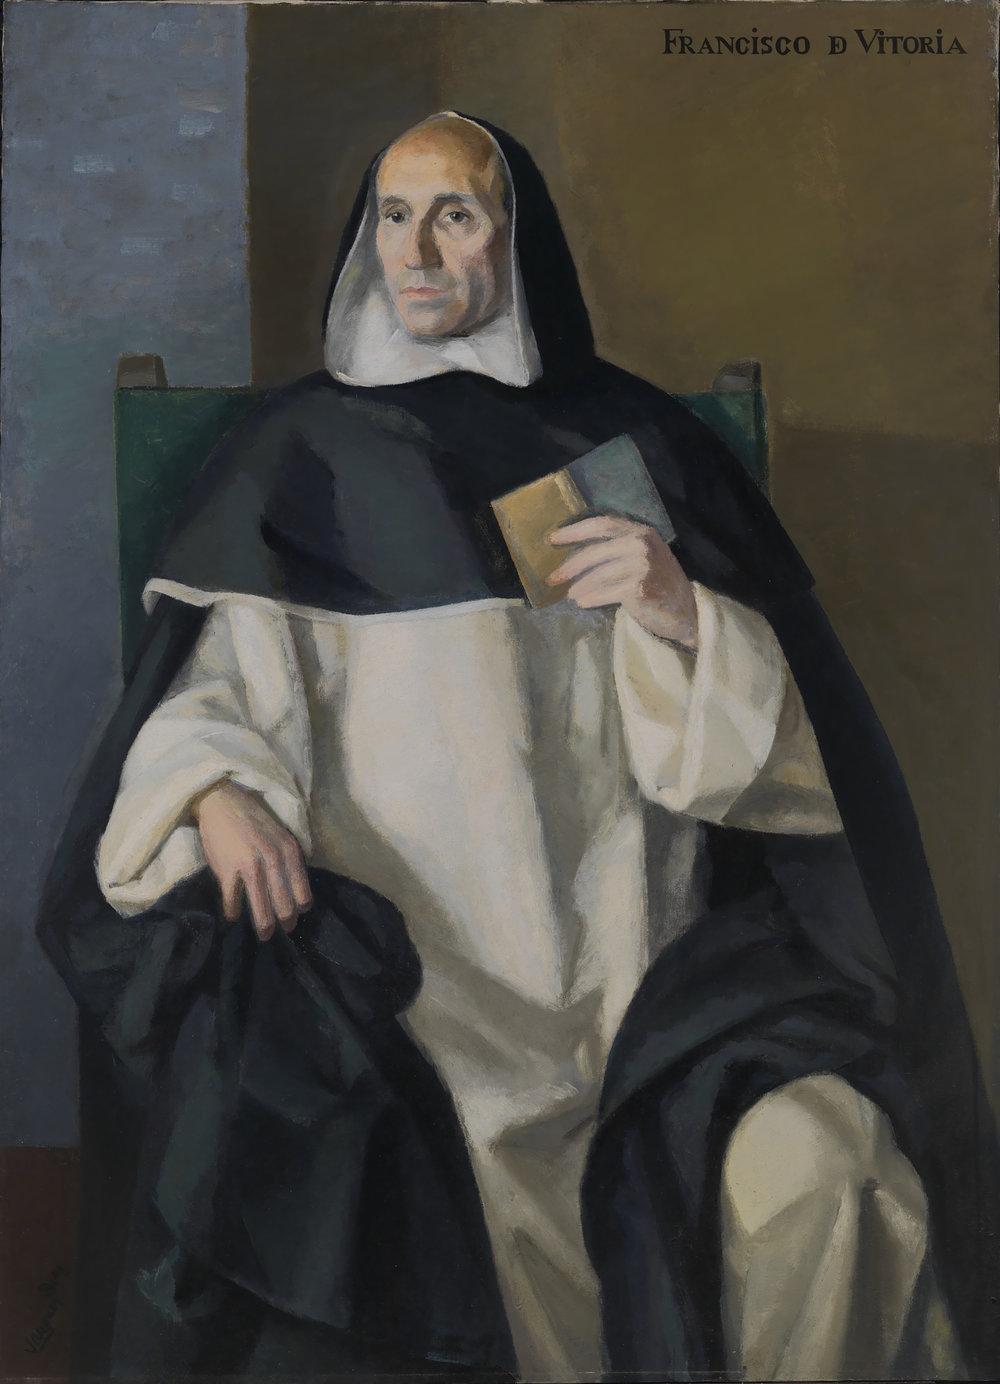 Frančišek de Vitoria (foto: americanart.si.edu)